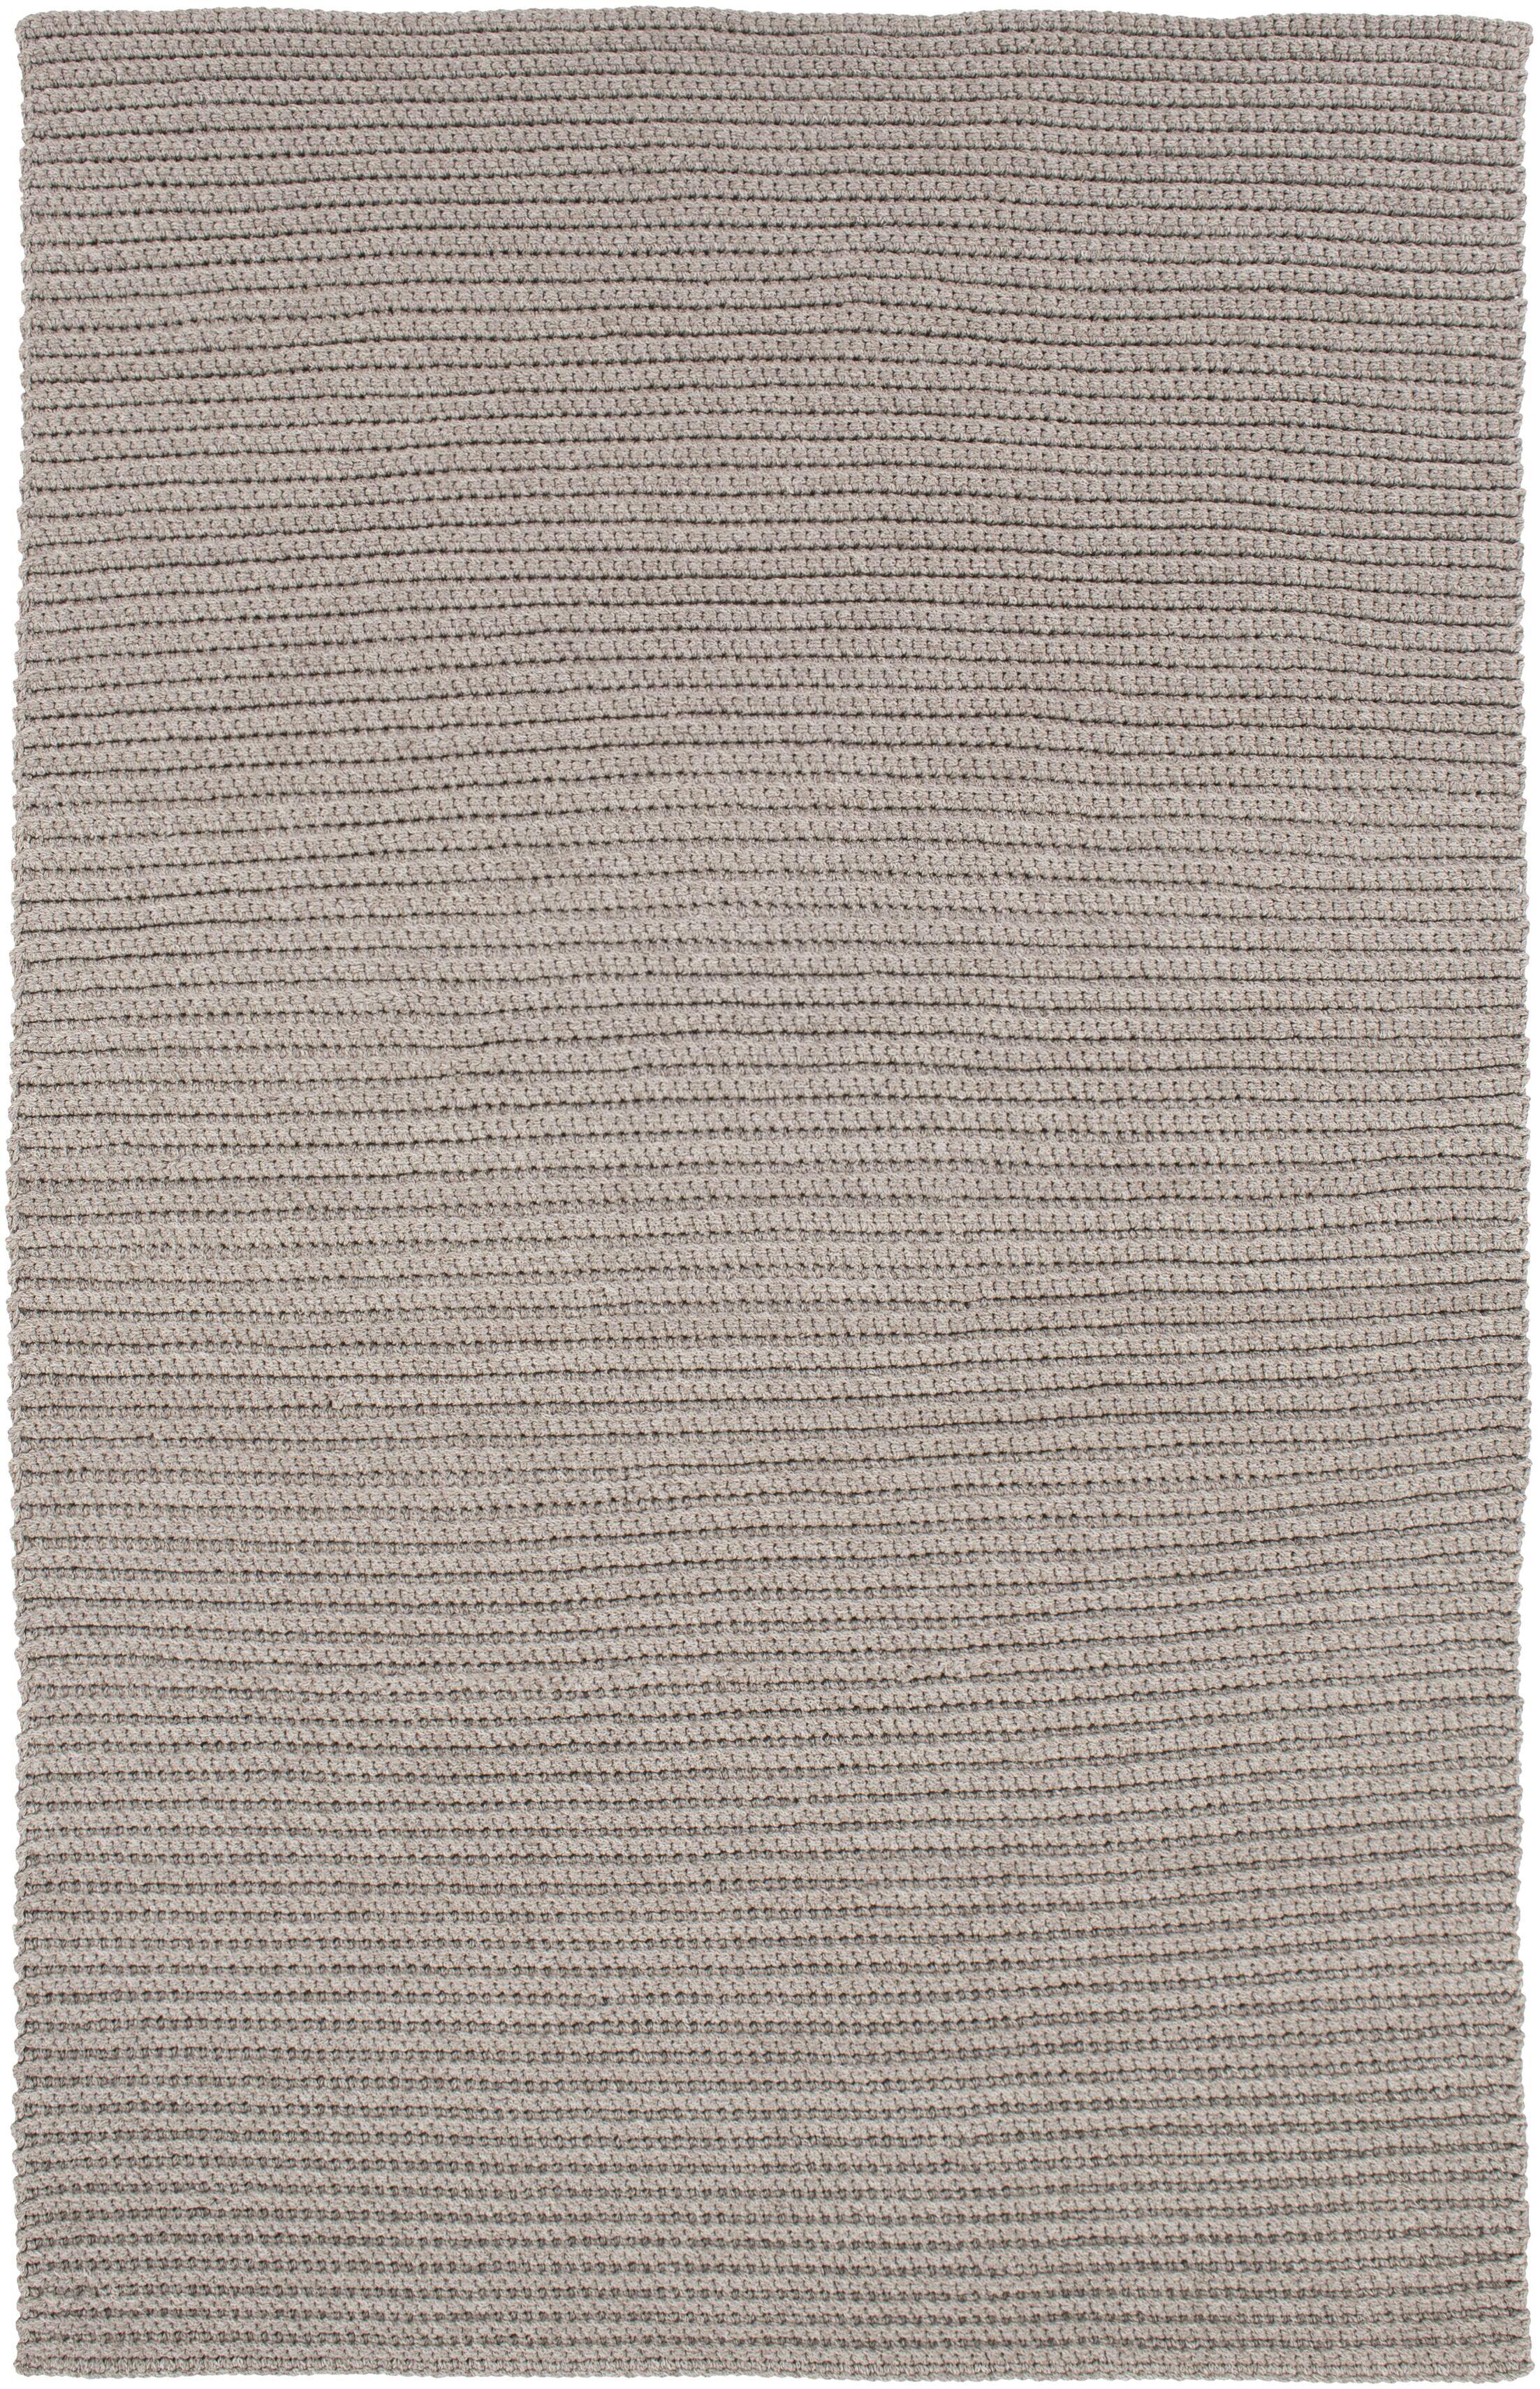 Woolverton Hand Woven Gray Indoor/Outdoor Area Rug Rug Size: Rectangle 2' x 3'